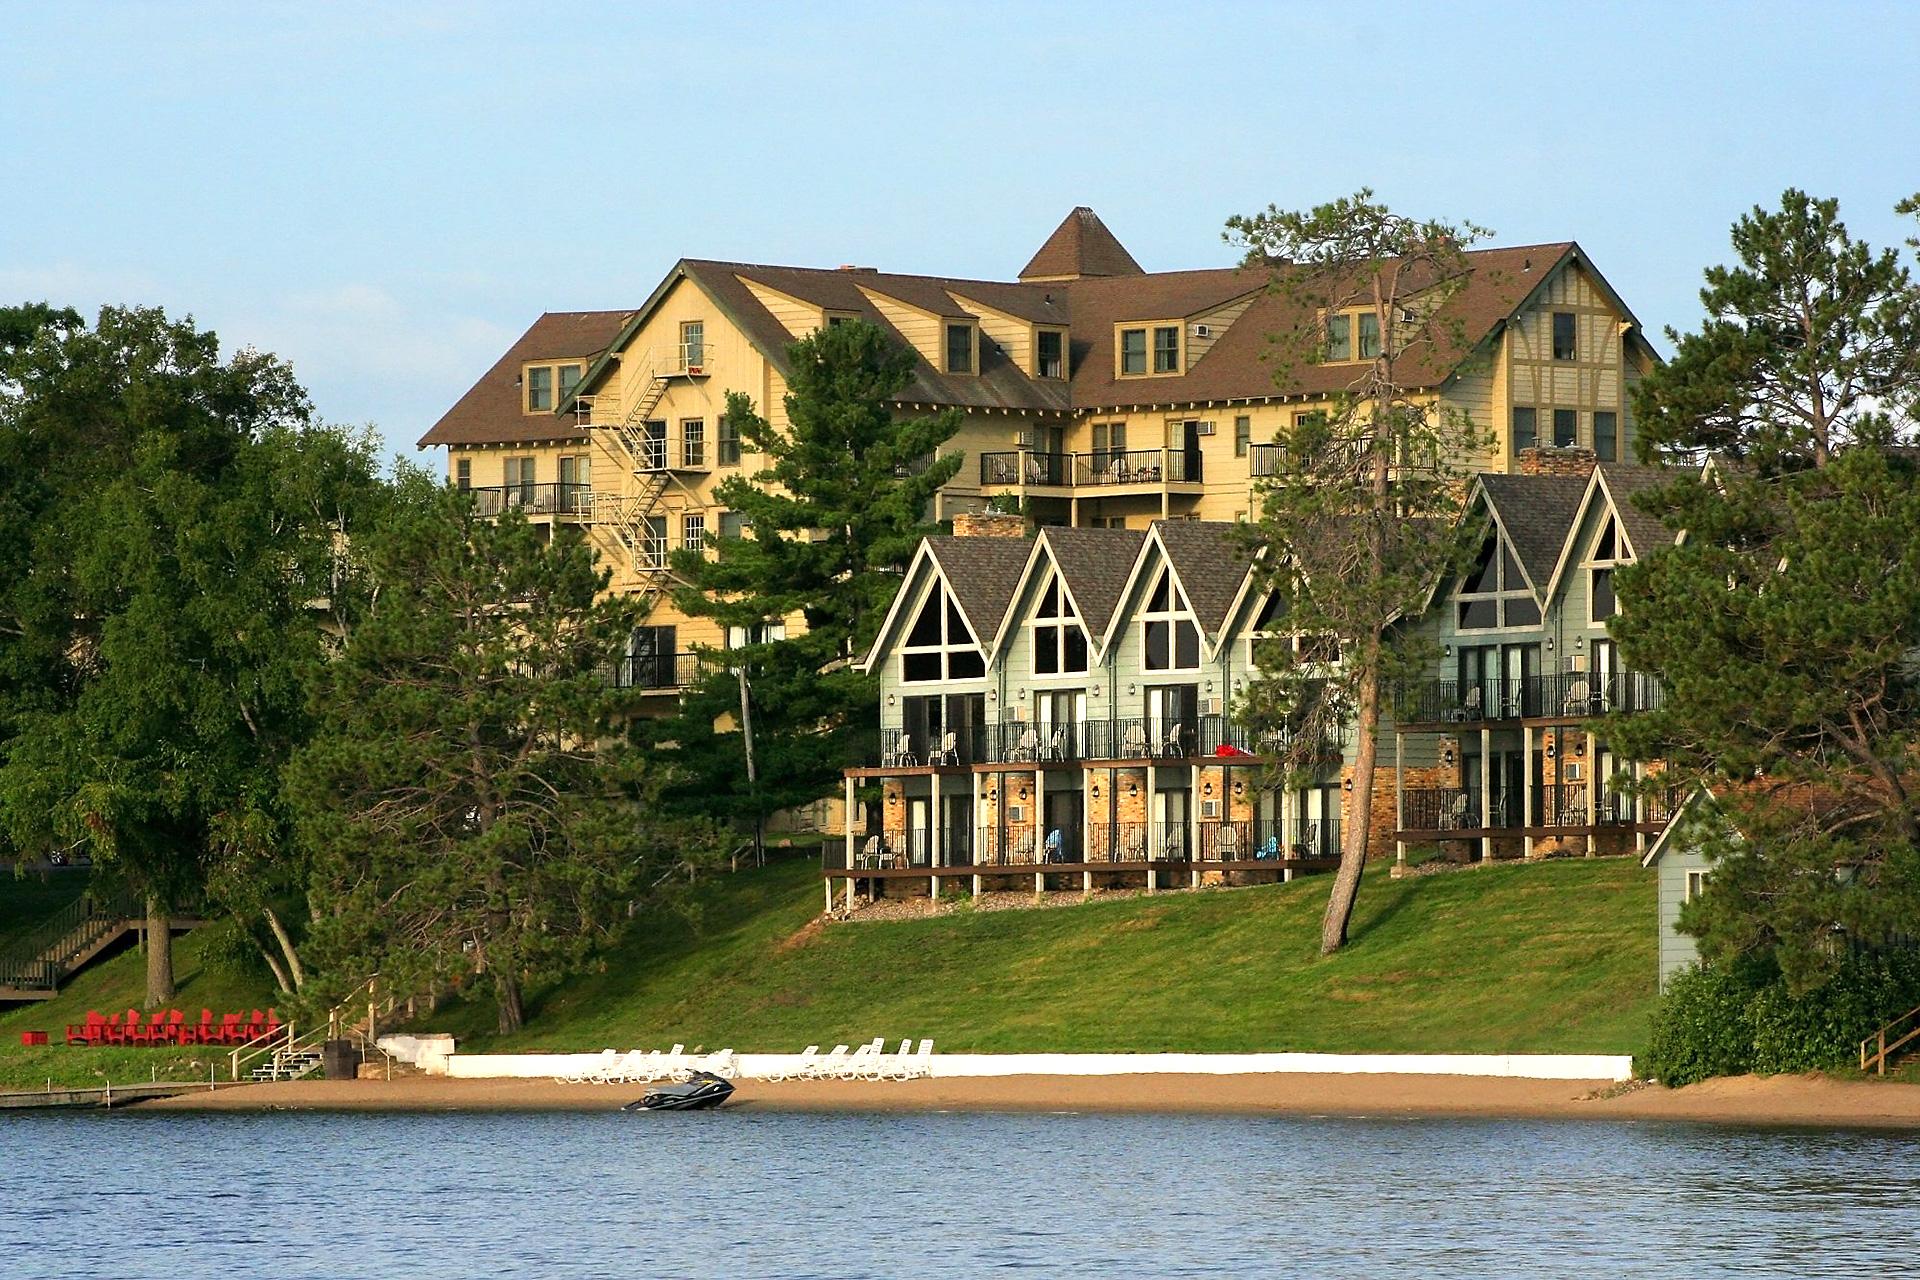 Sunrise Villas at Madden's on Gull Lake; Courtesy of Madden's on Gull Lake